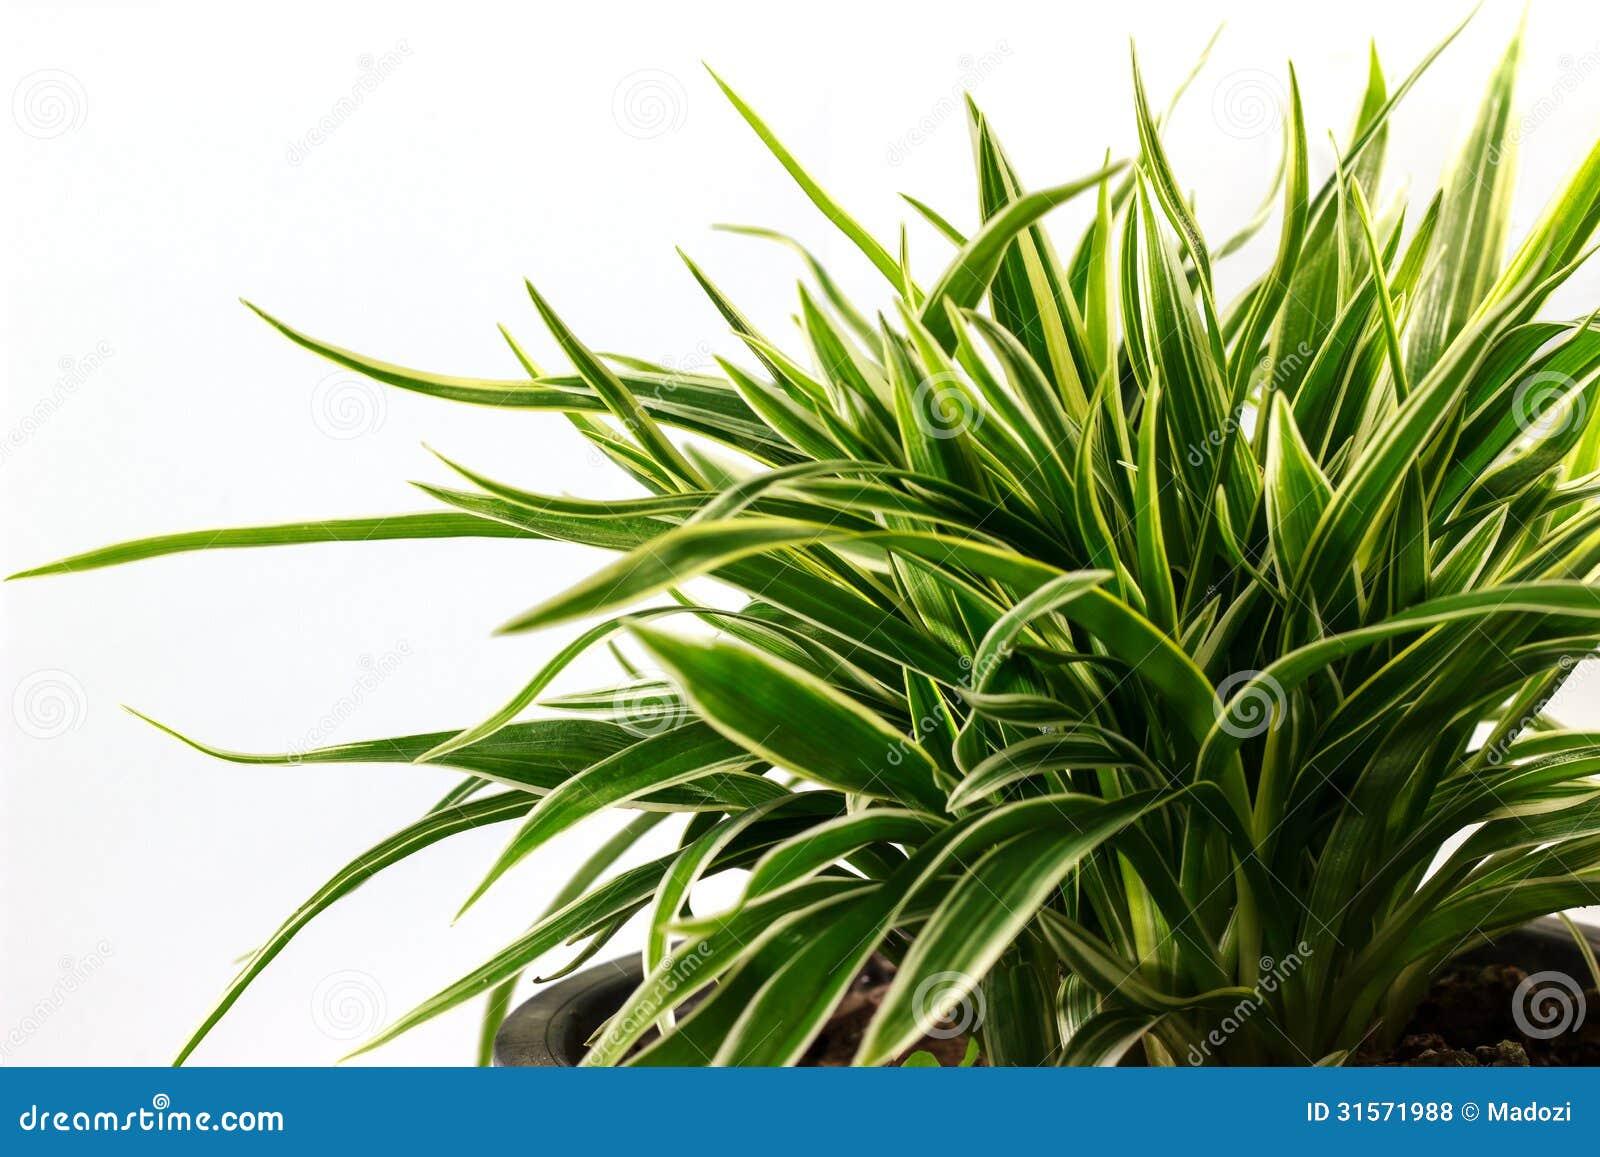 Striped Dracaena Plant Royalty Free Stock Photos Image